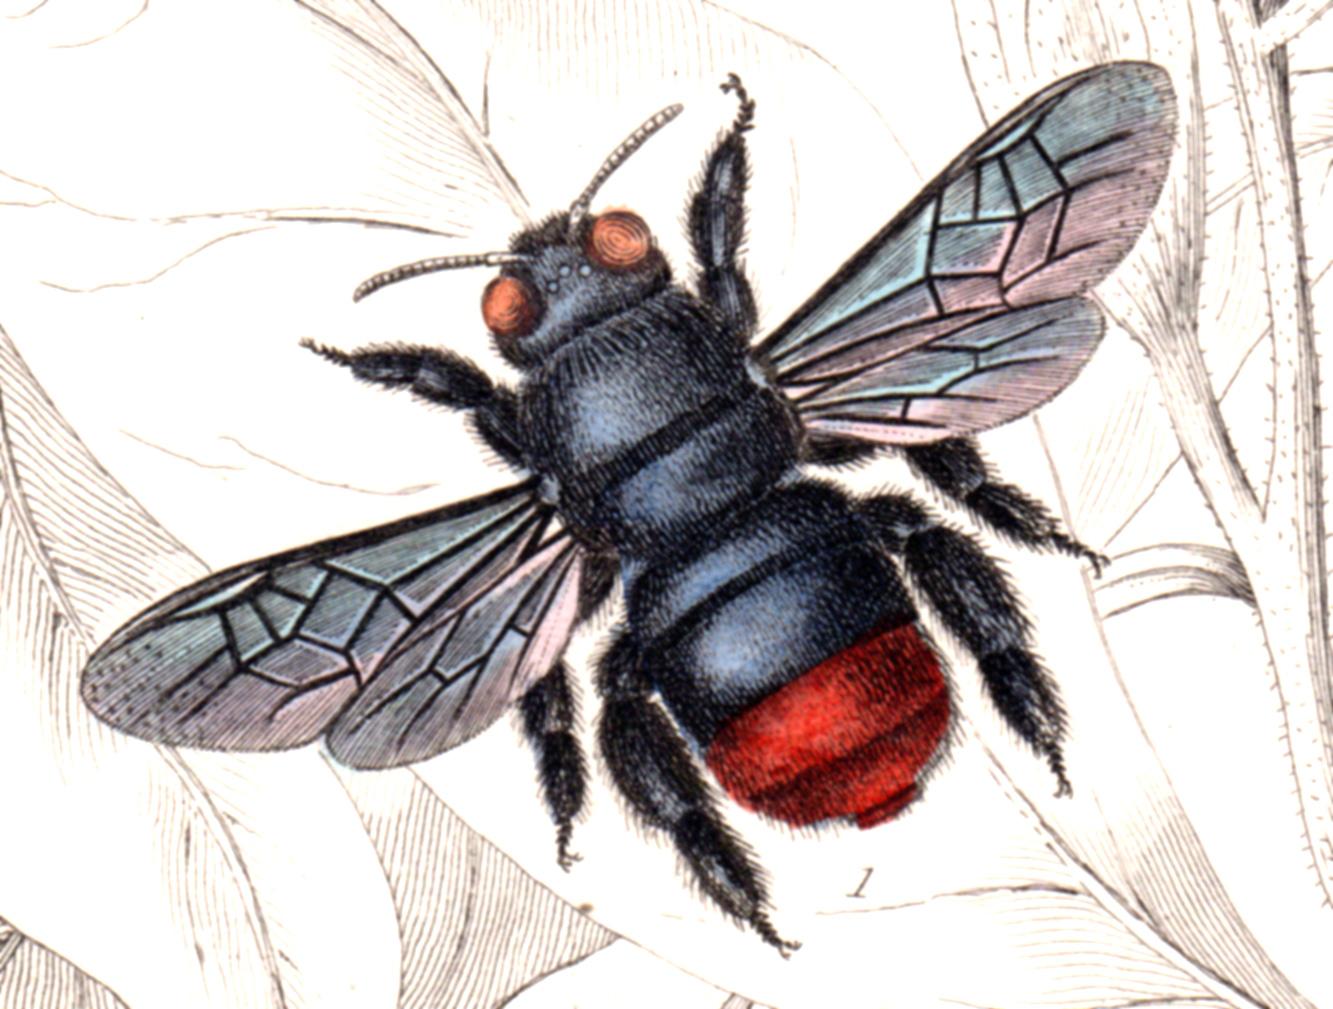 Jardine, Sir Wm / Lizars, Wm – Bees, Insects